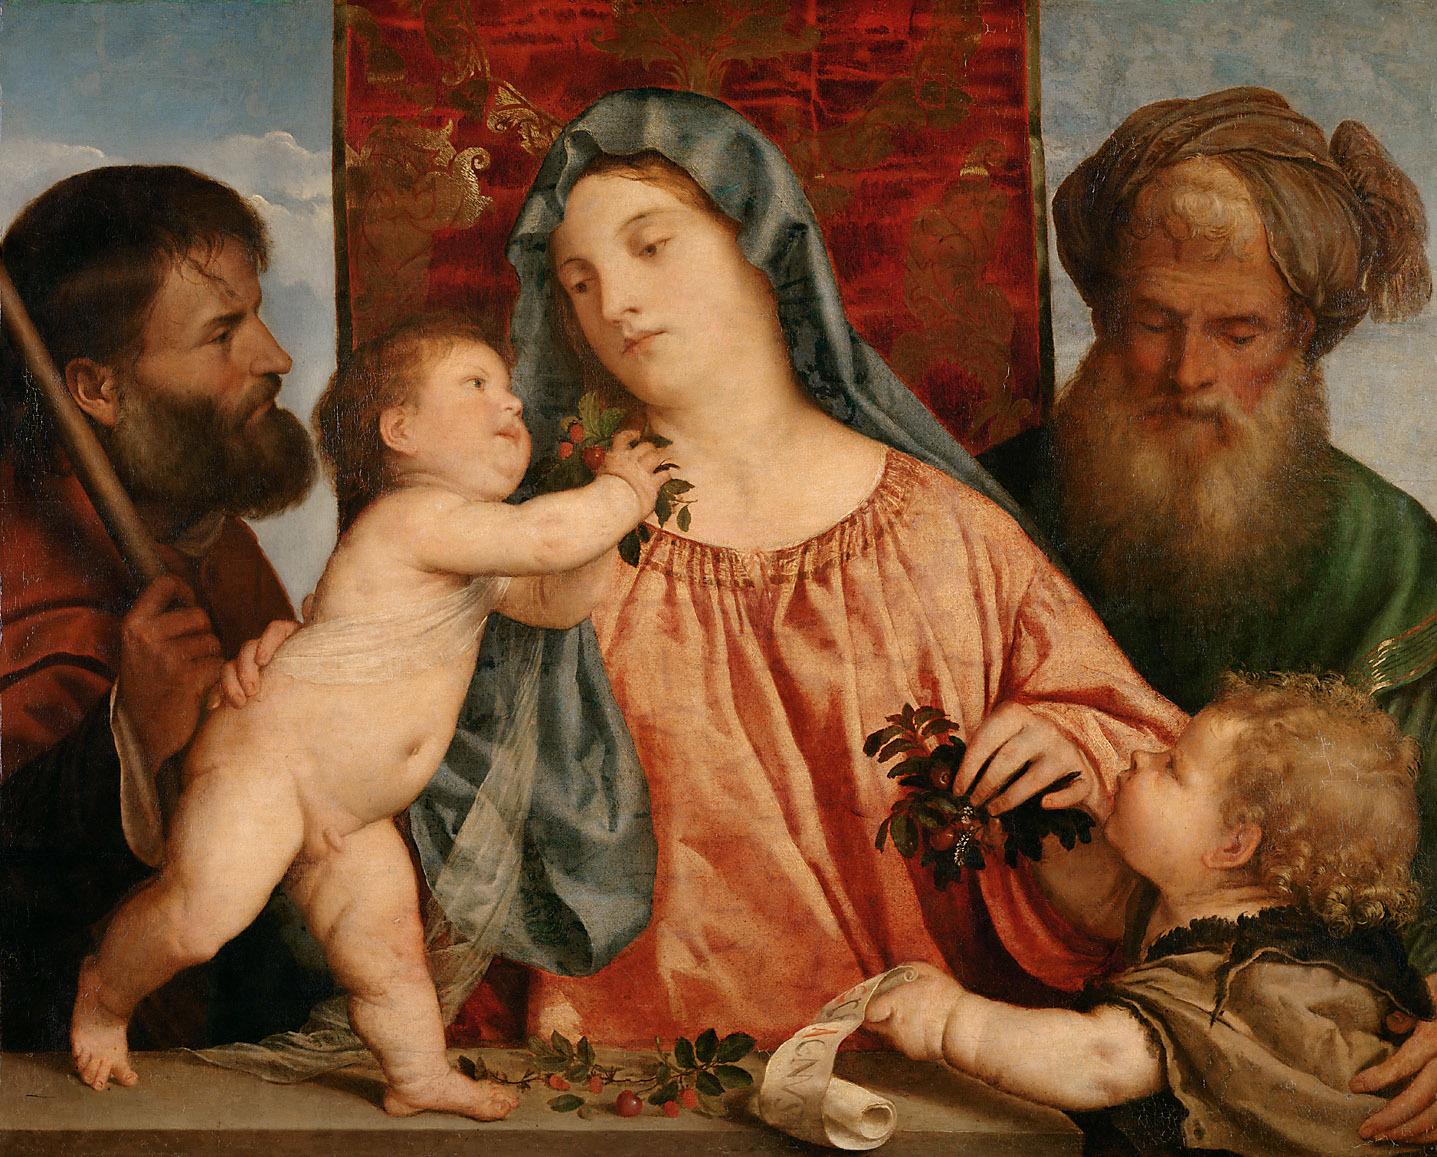 Una madre in vendita s3 valentinacanali gloriadonnini jk1690 6